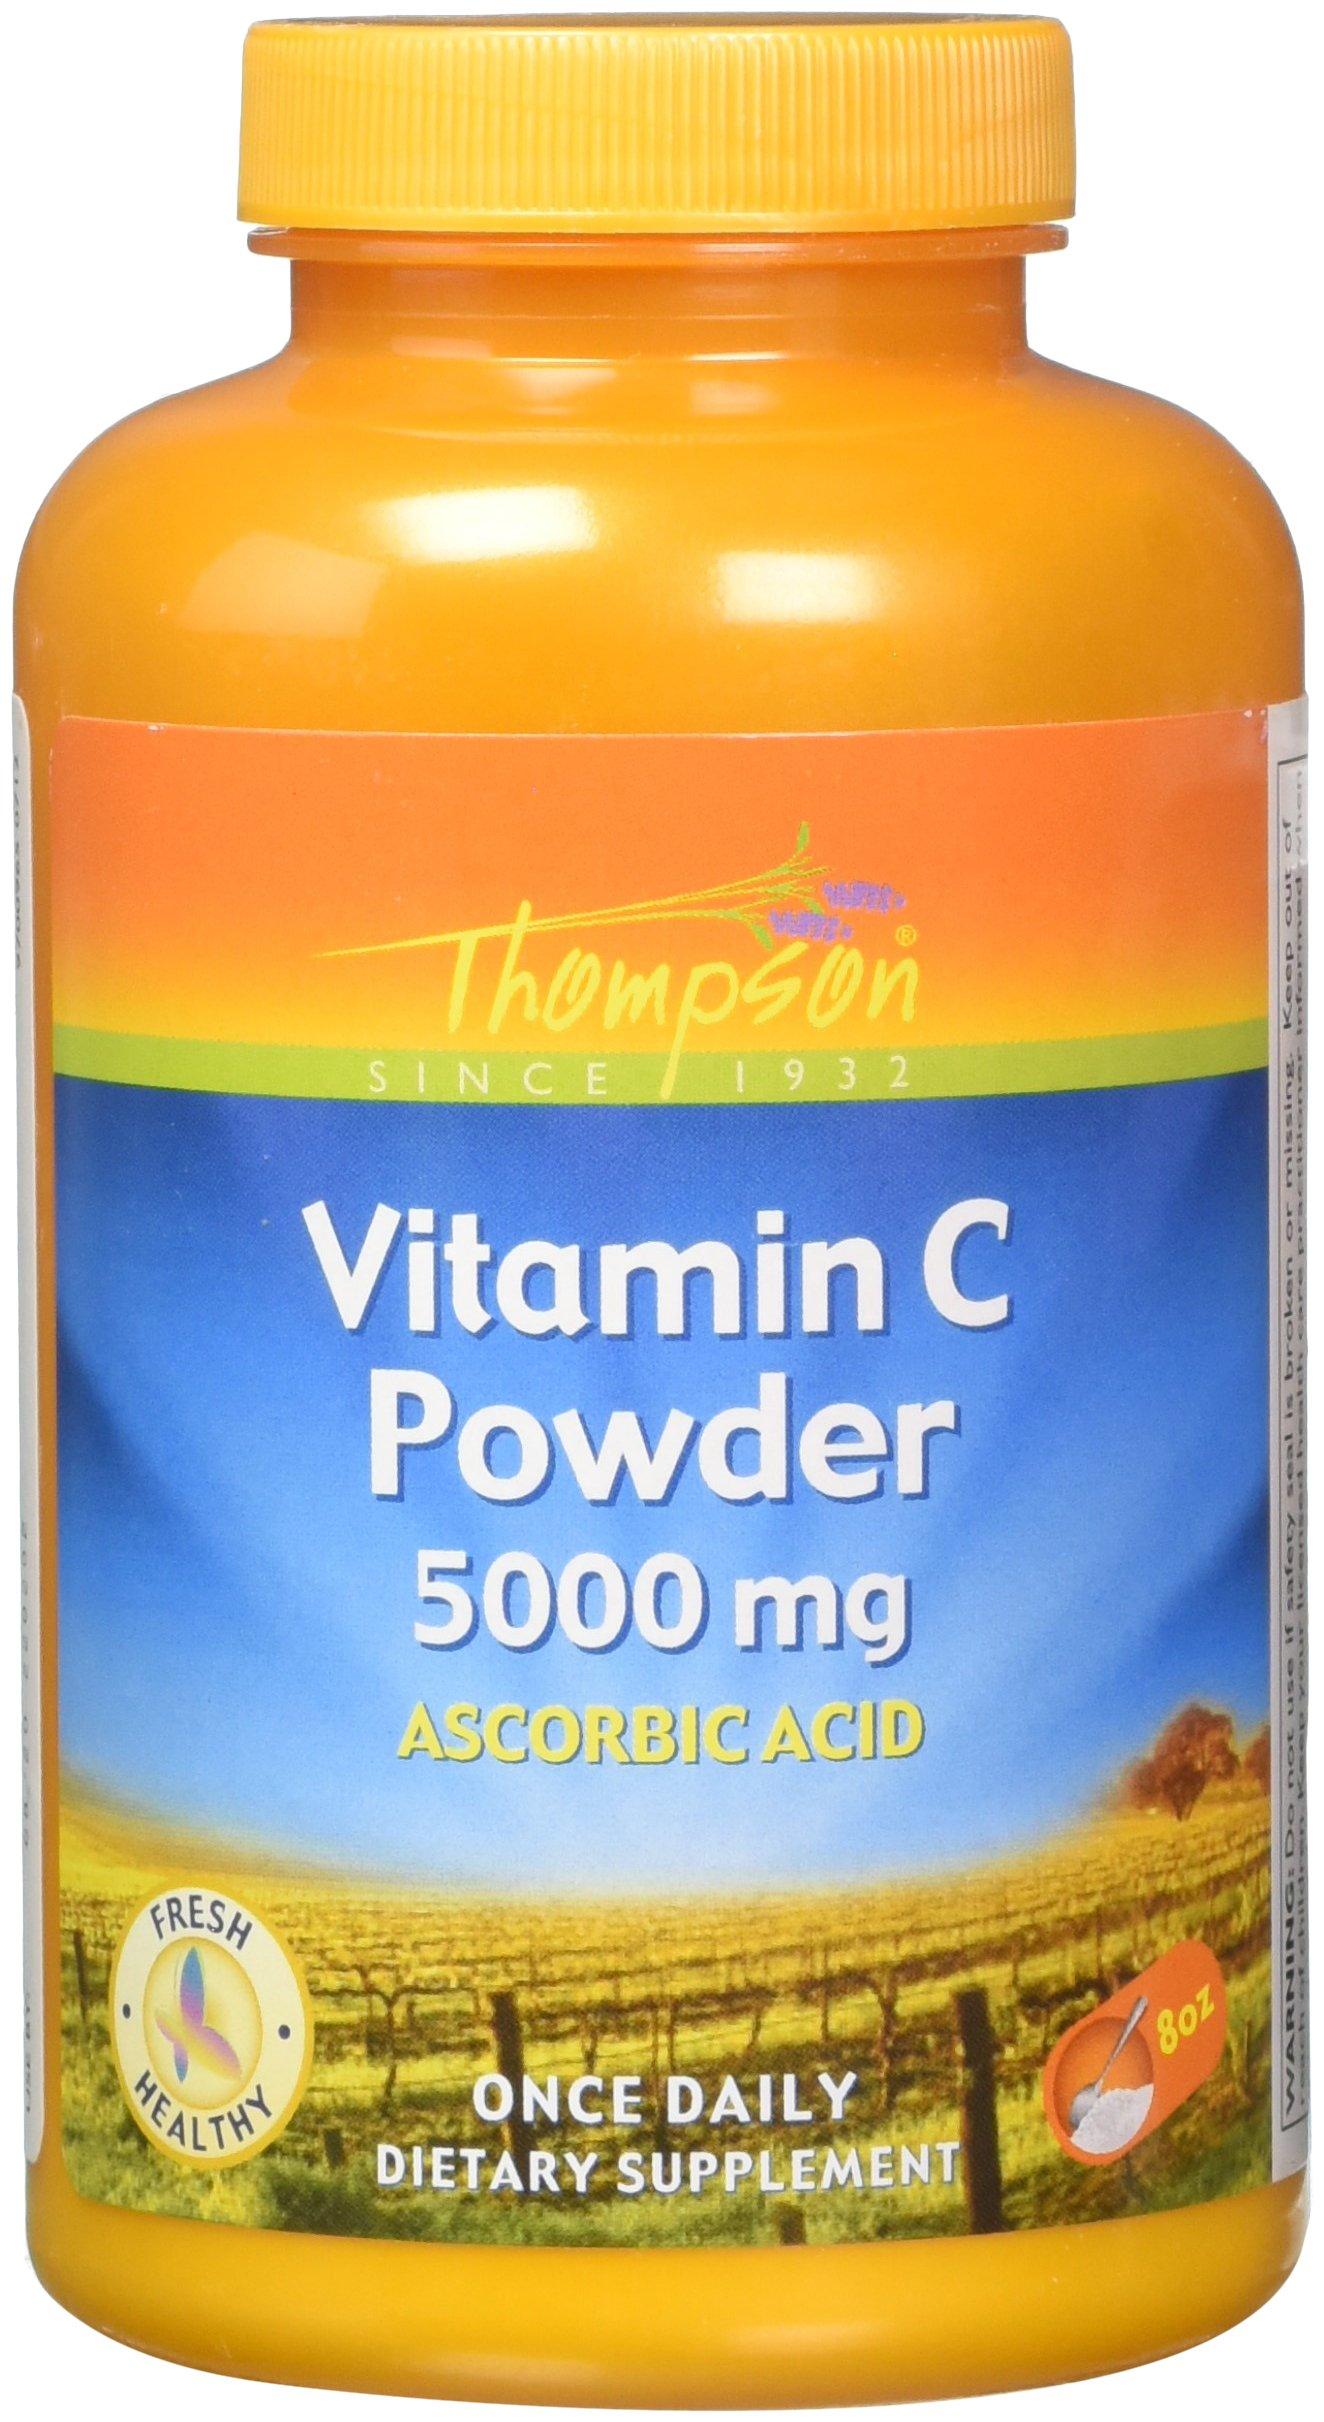 Thompson Vitamin C Powder -- 5000 mg - 8 oz